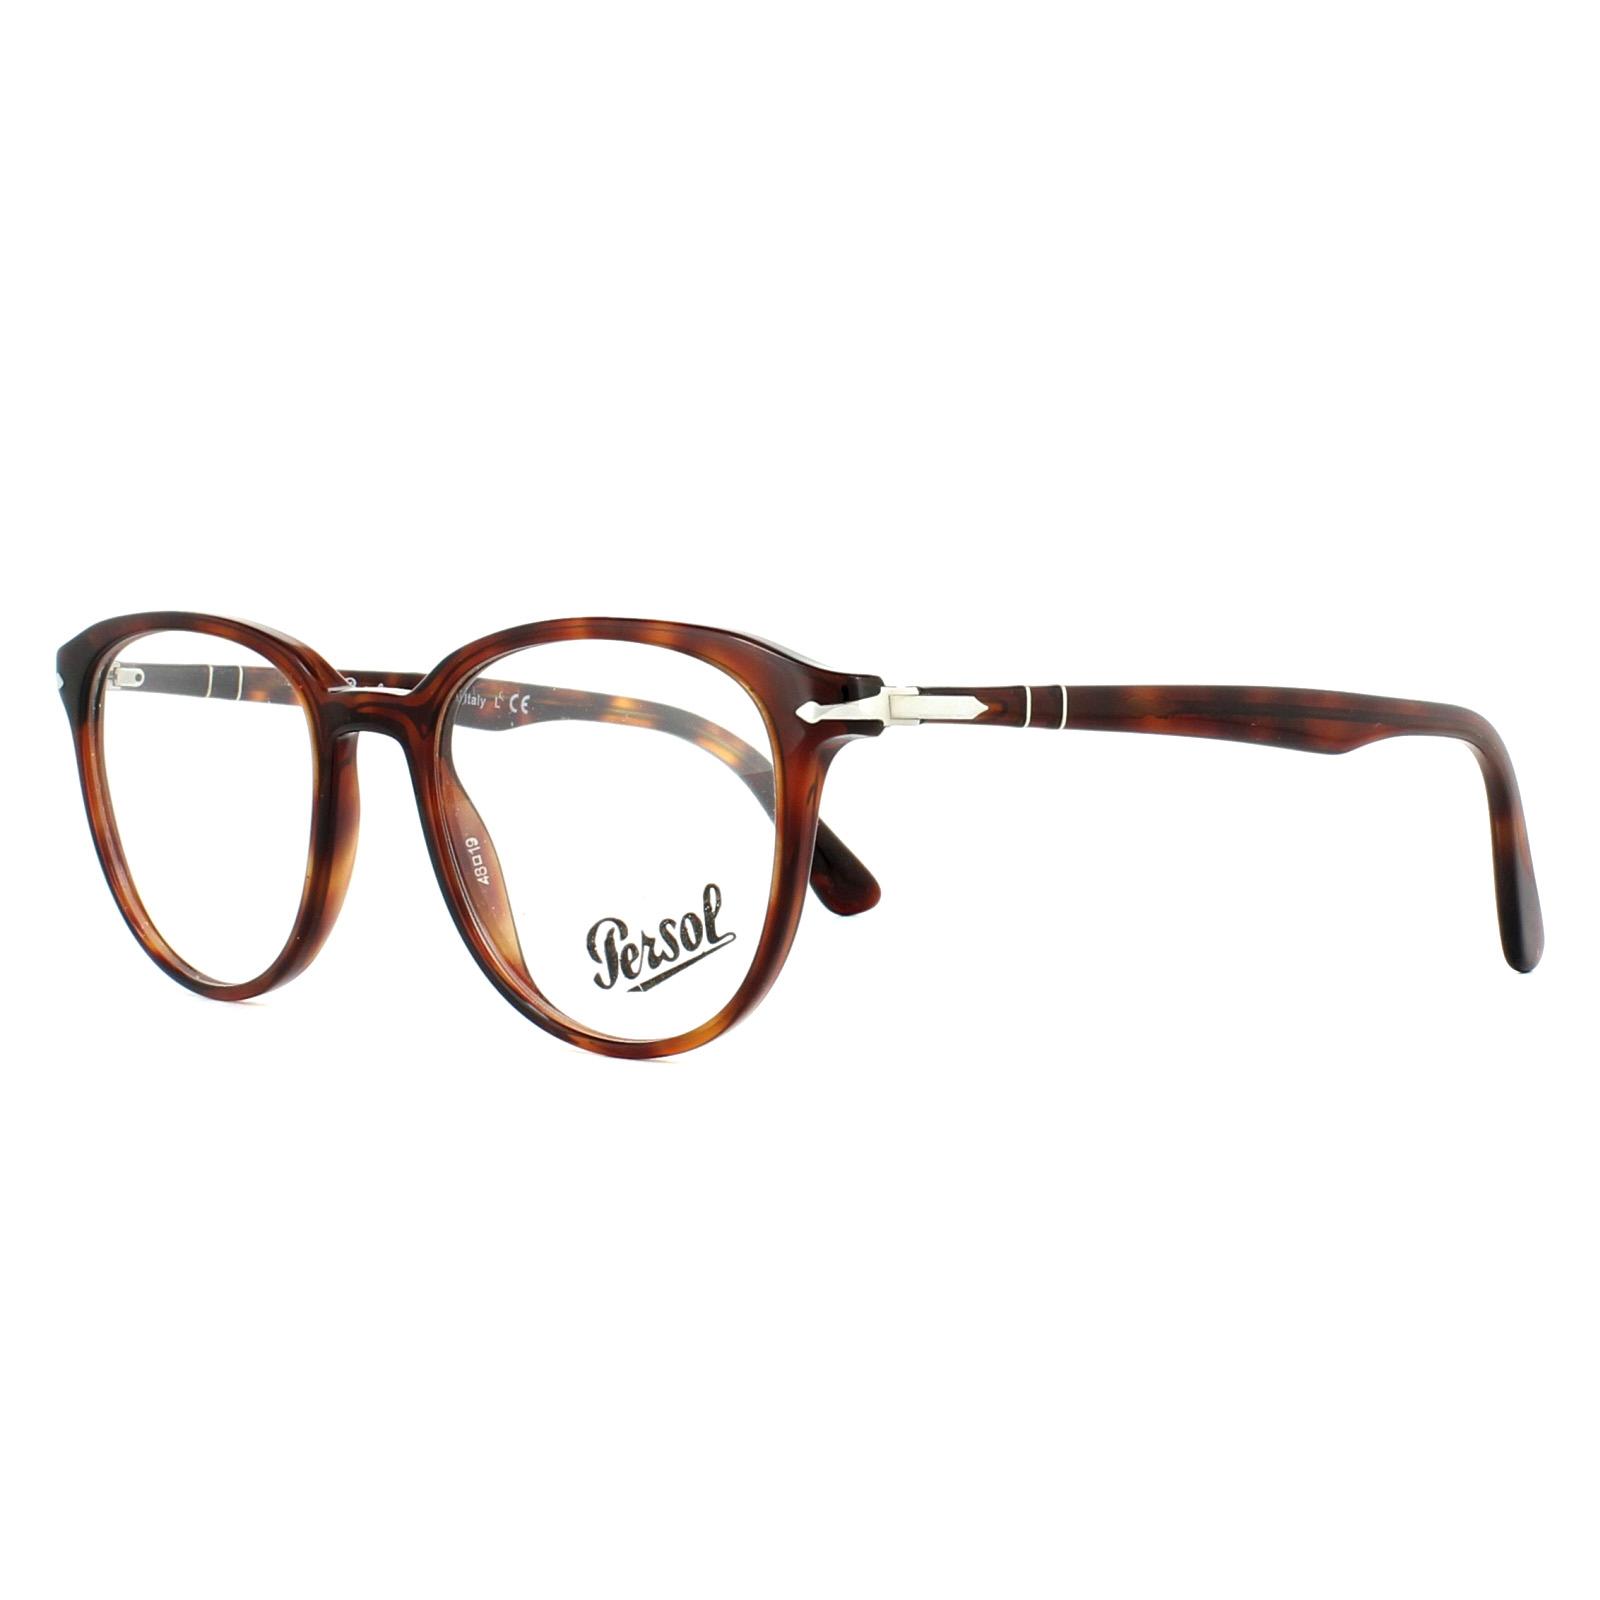 1702d252a61 Persol Glasses Frames PO3176V 24 Havana 48mm Mens 8053672759839